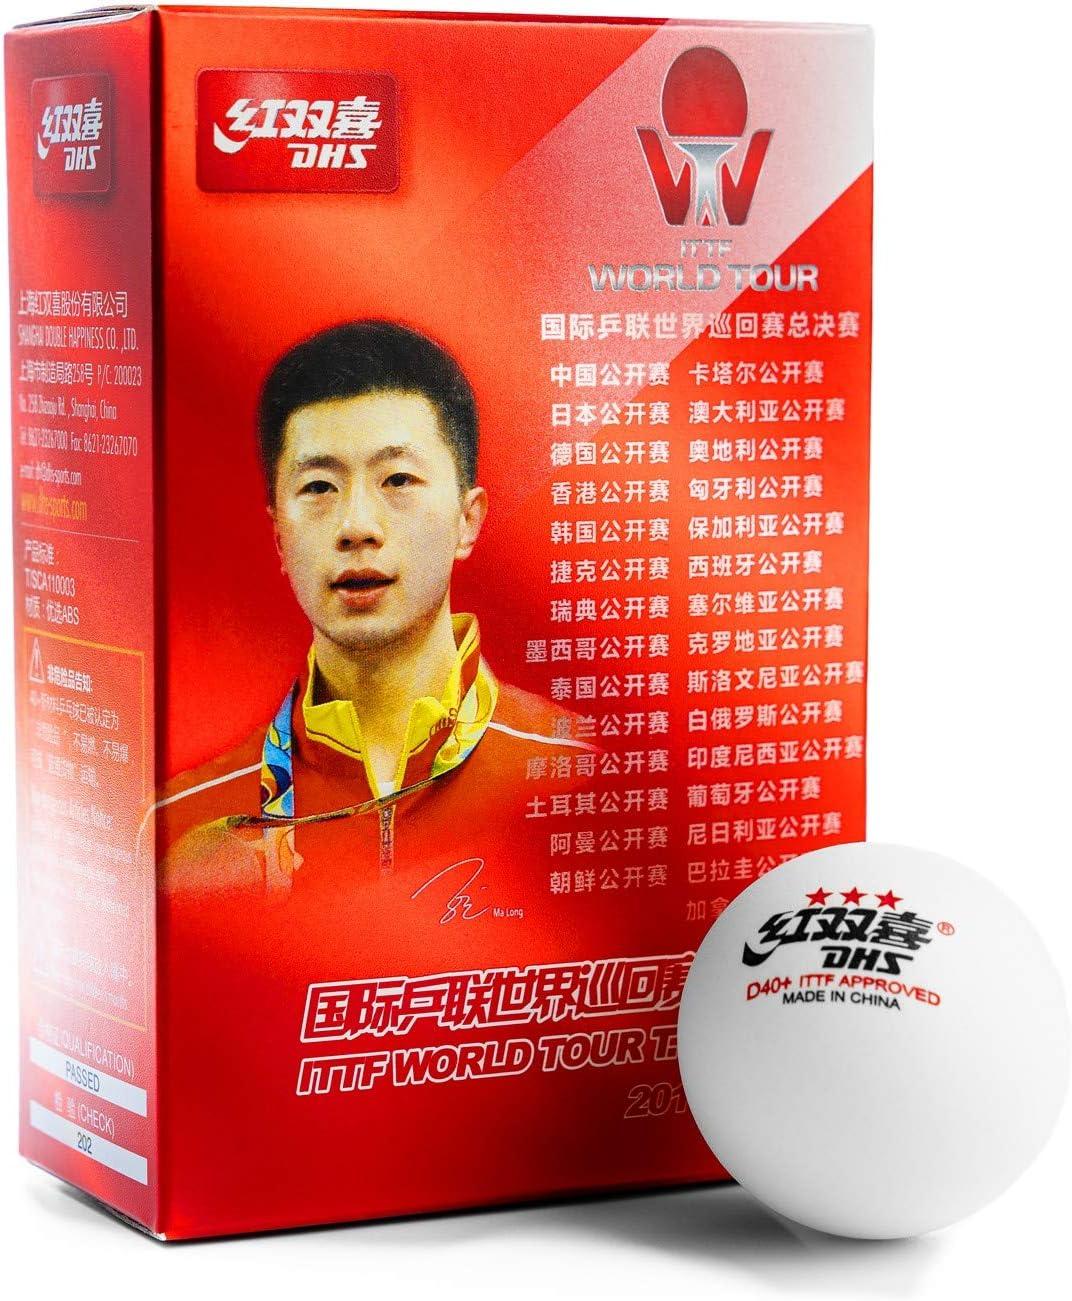 DHS D40 3 ITTF World Tour Table Tennis 6 Balls